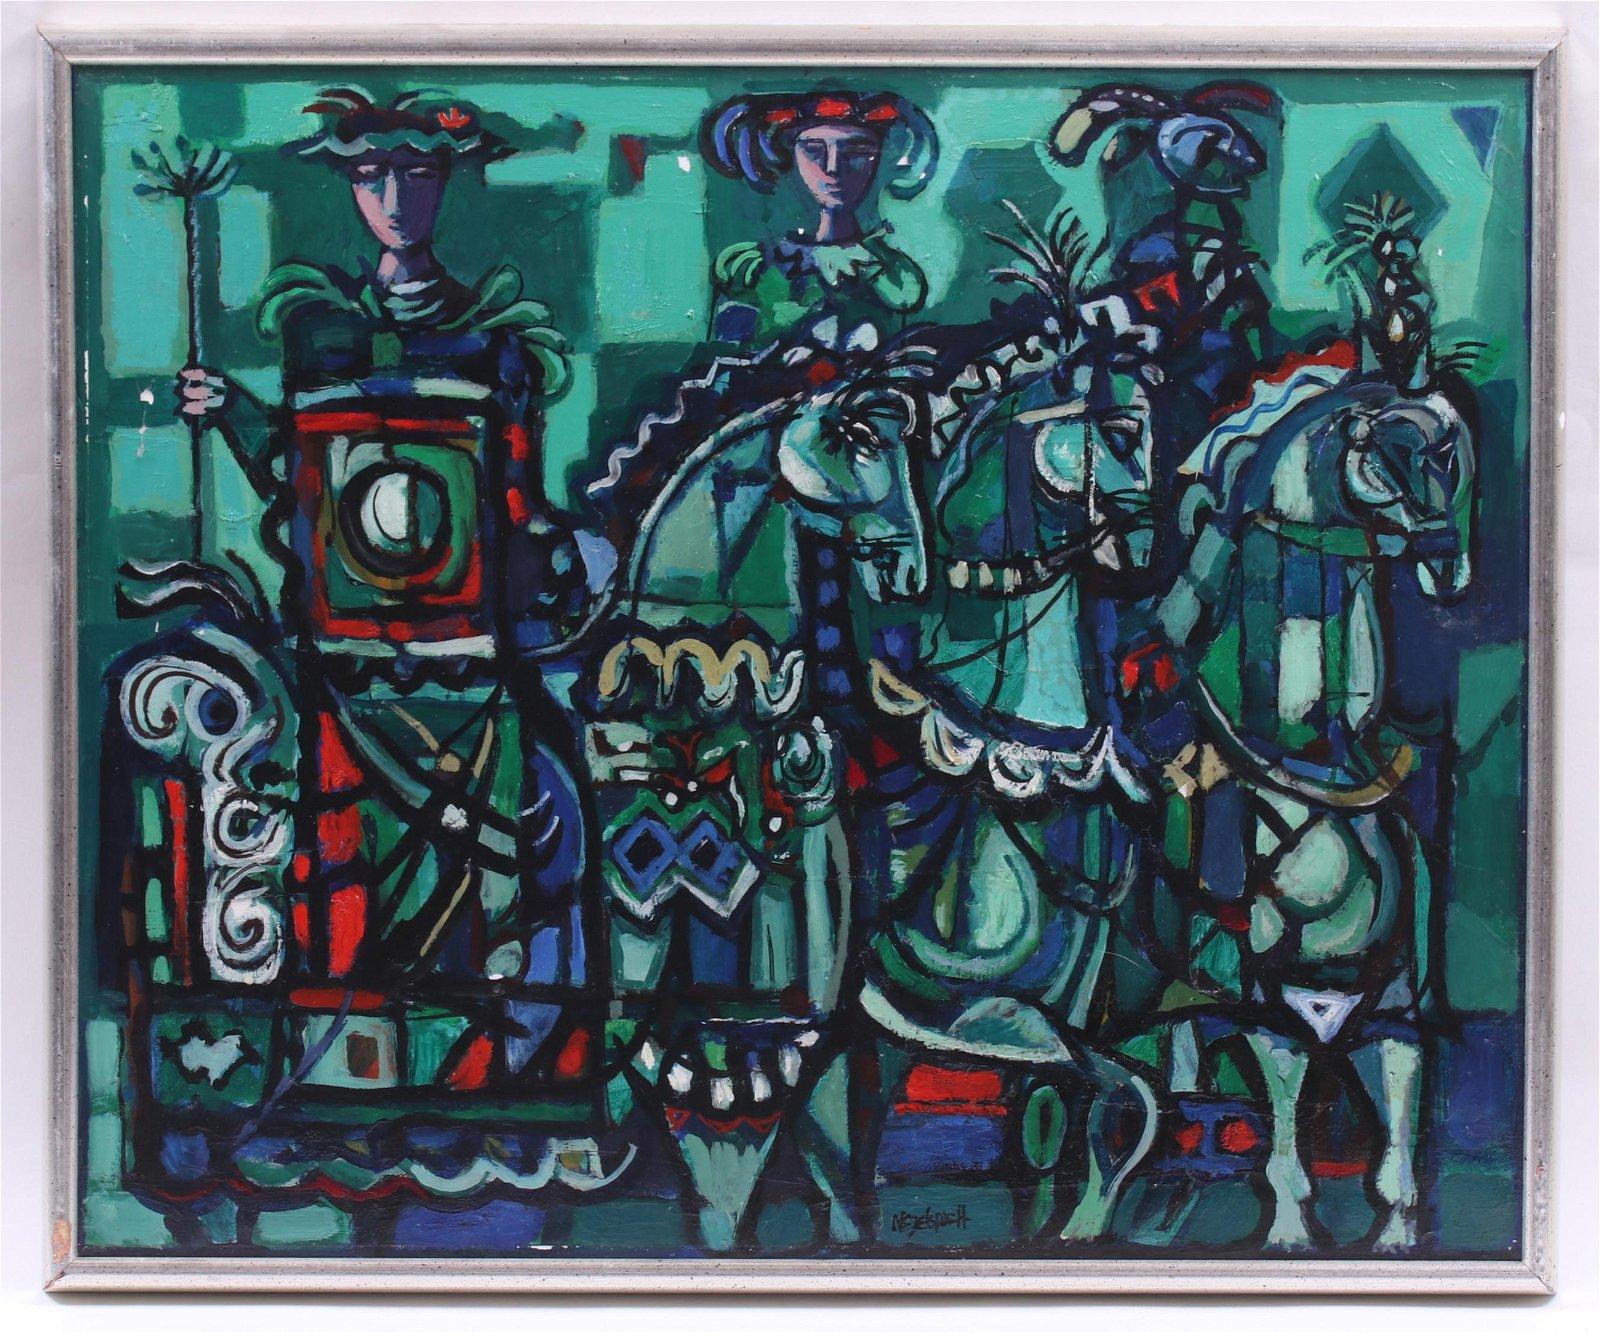 Gerard Negelspach (American b. 1927) Oil on Canvas